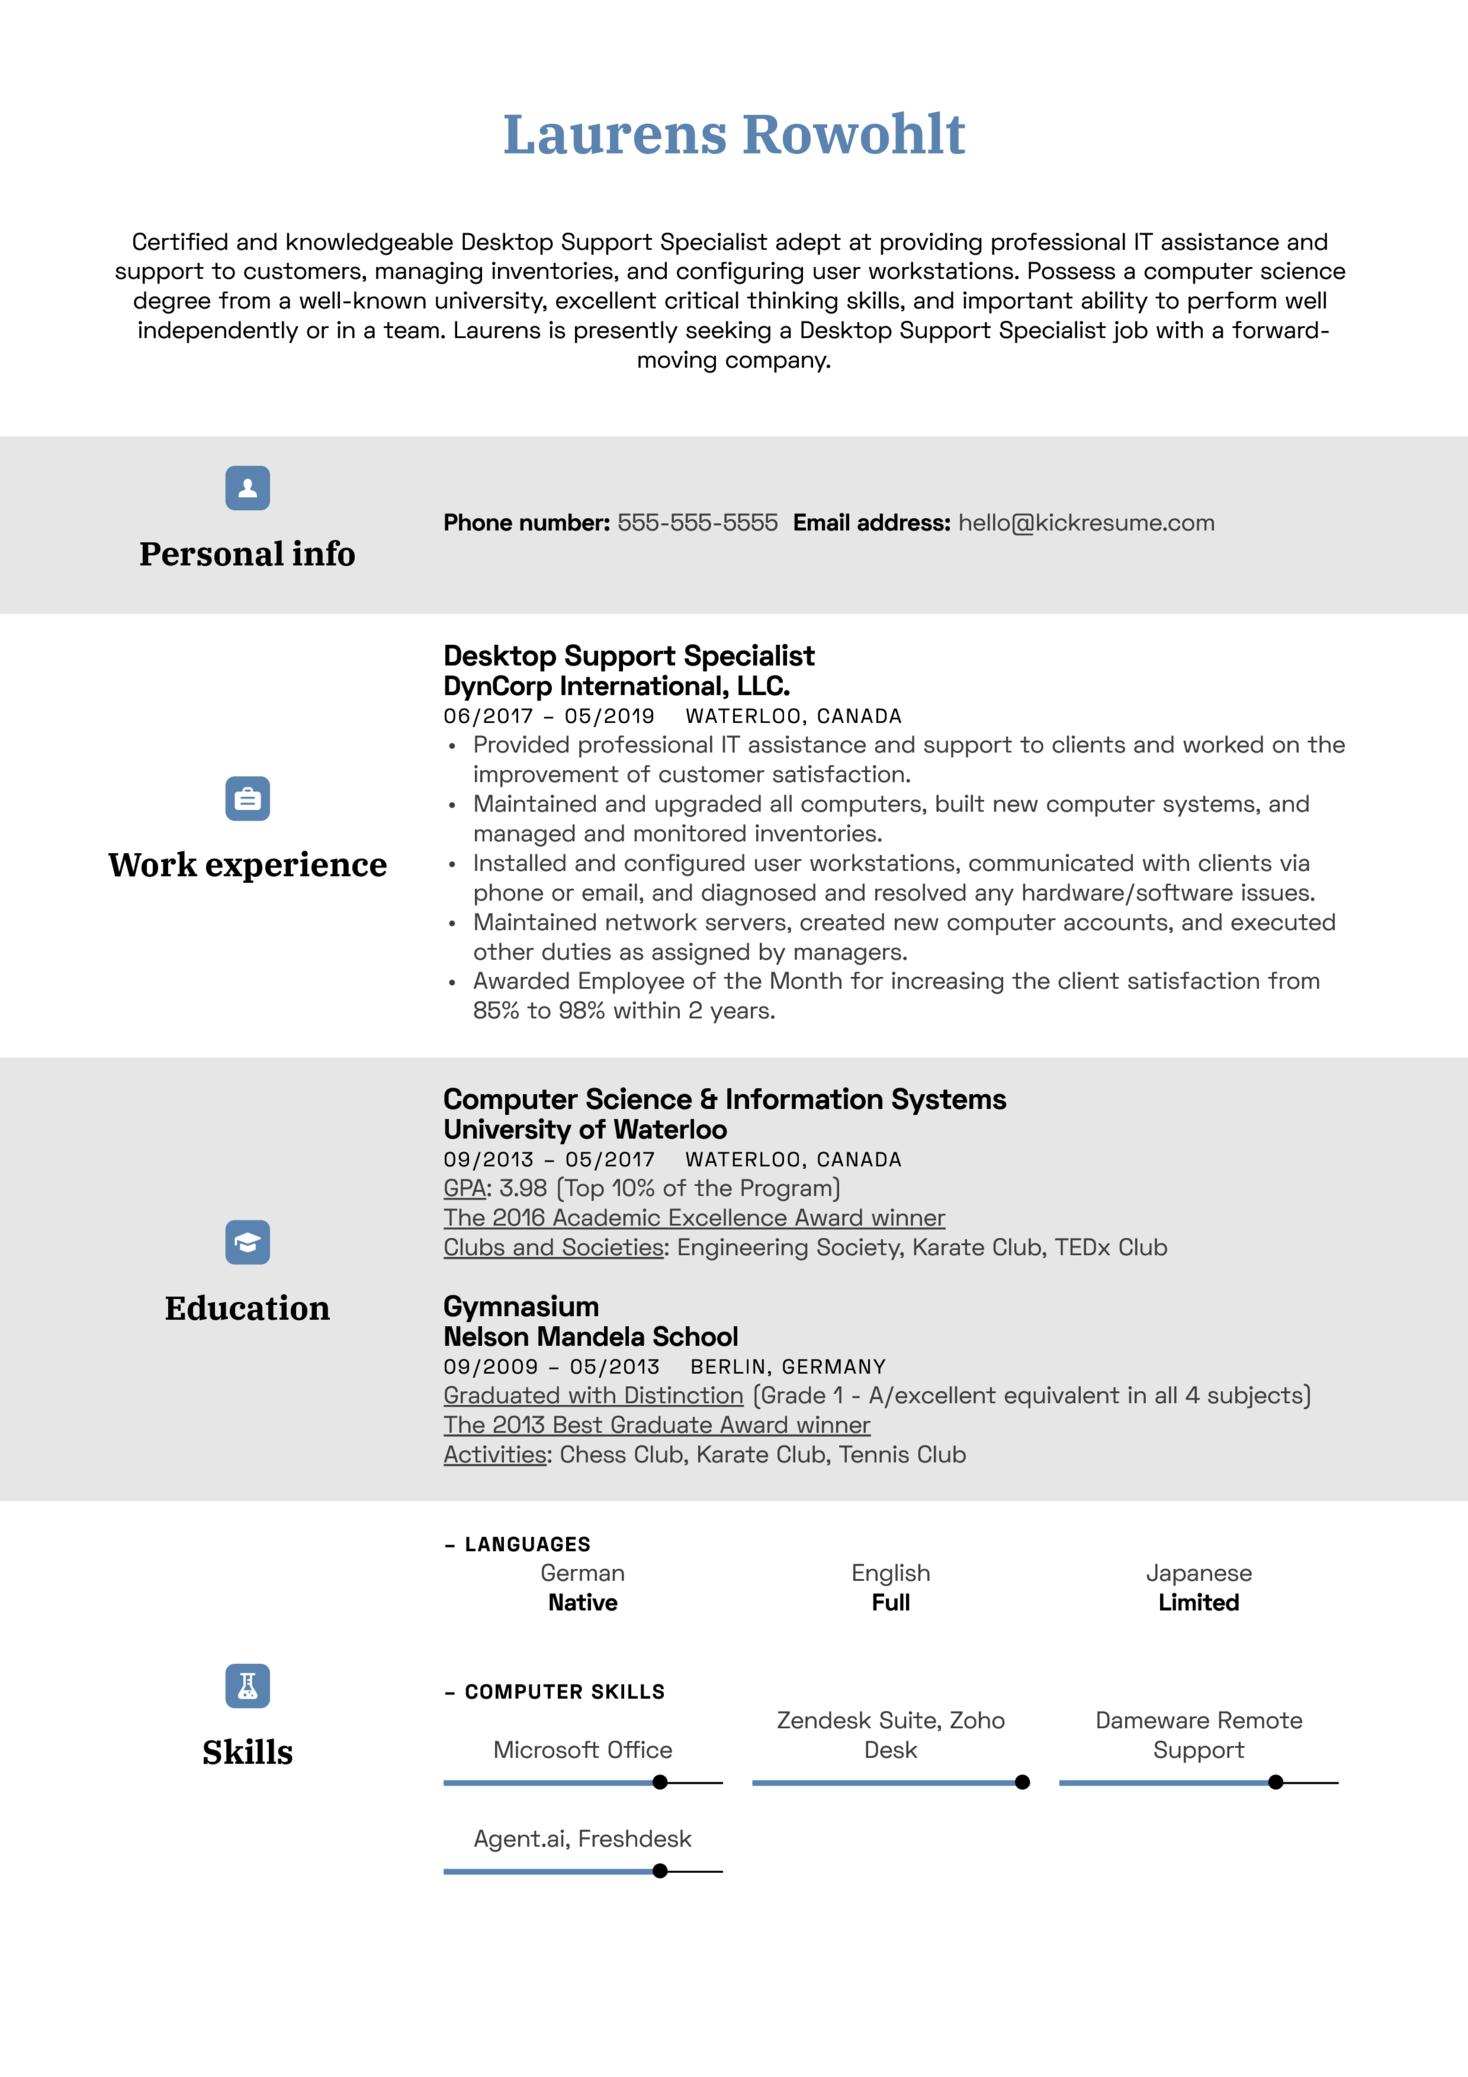 Desktop Support Specialist Resume Sample (parte 1)